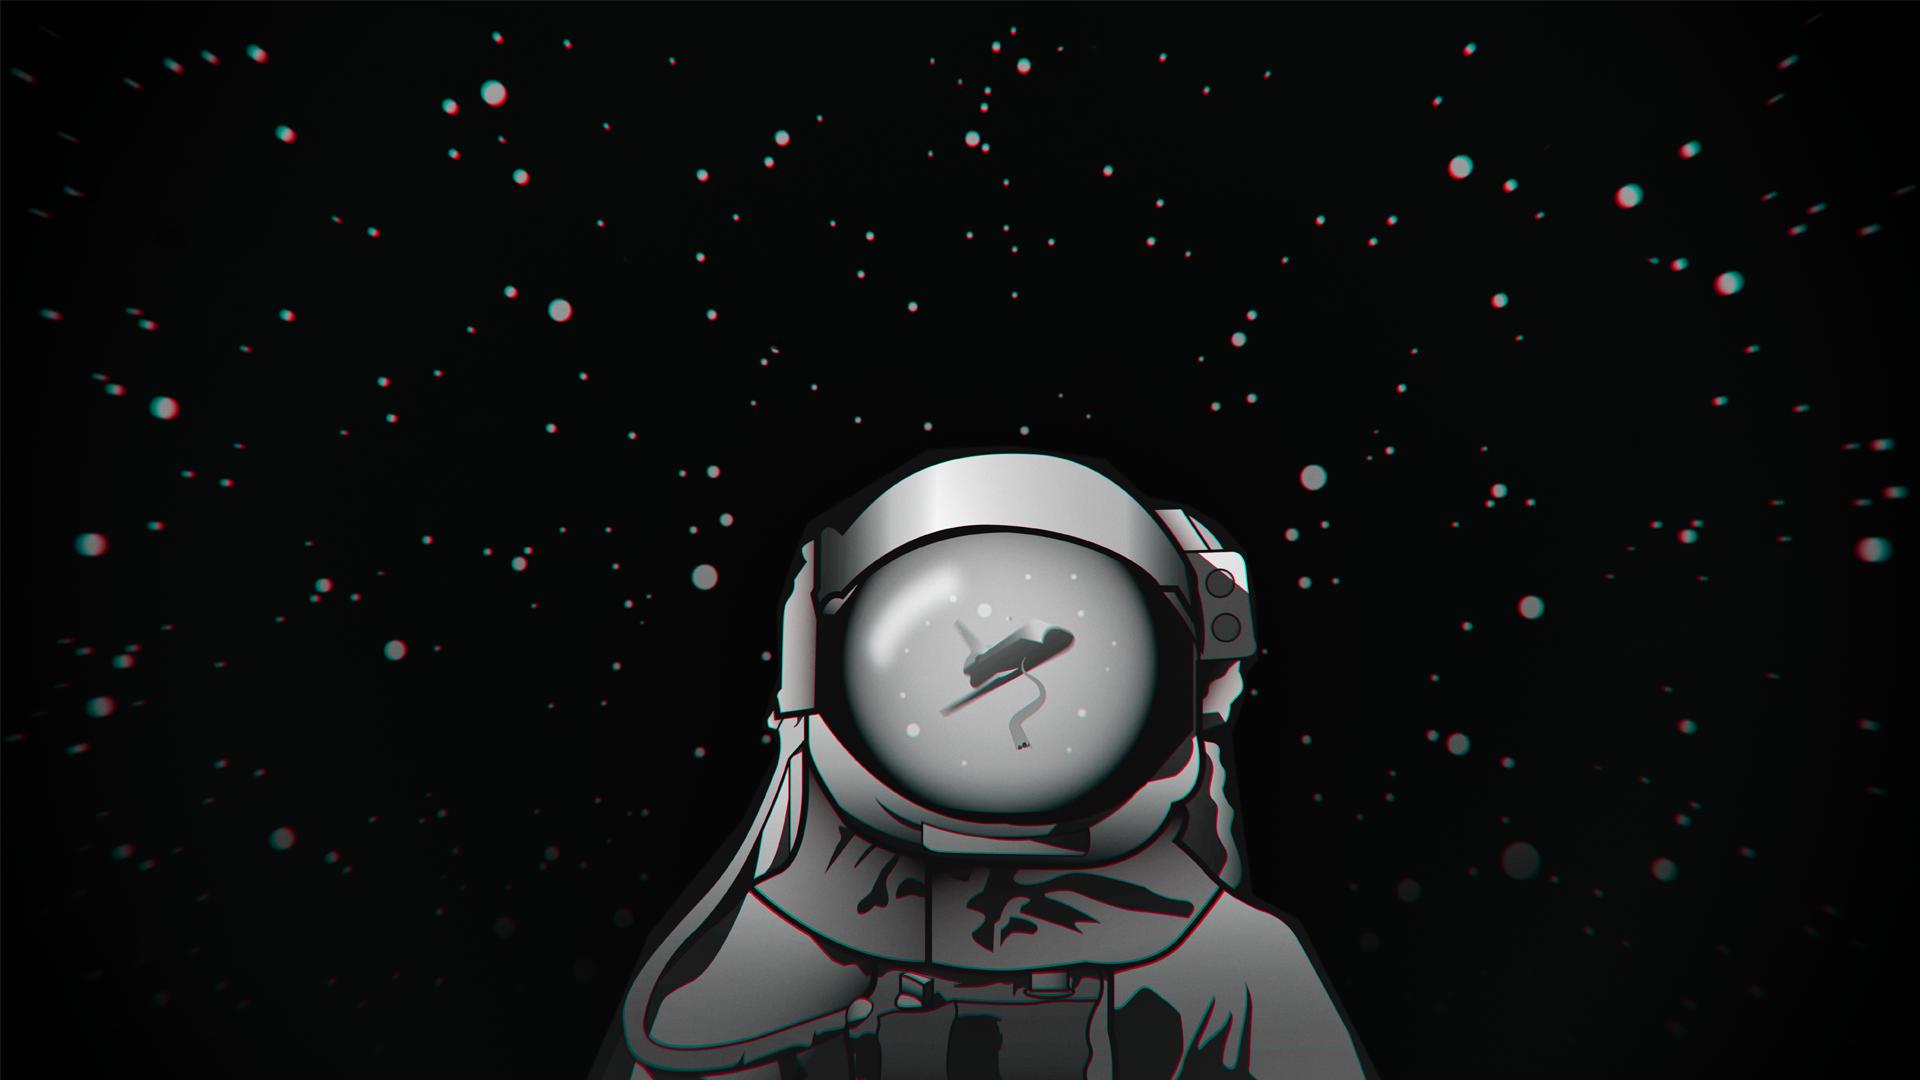 Deep Space - Wallpaper | 1920x1080 by Array1337 on DeviantArt